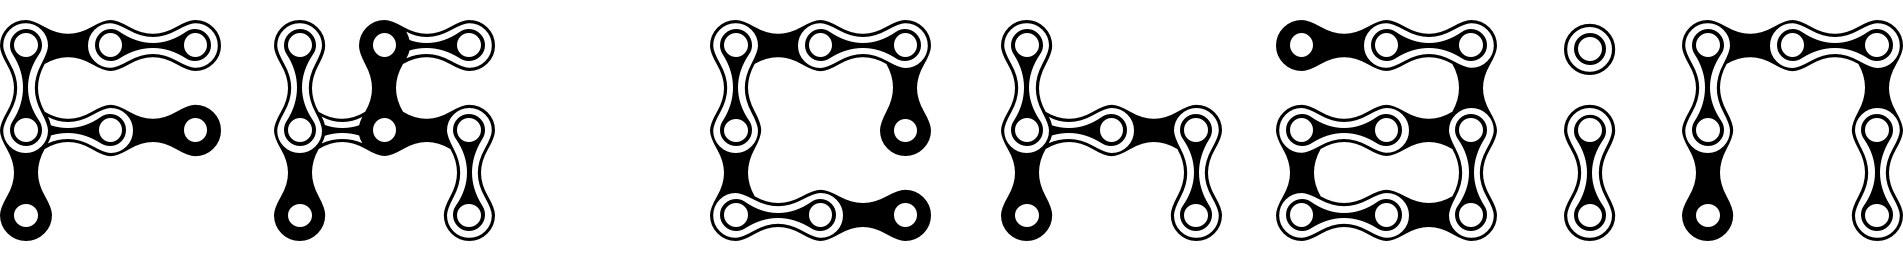 FK Chain